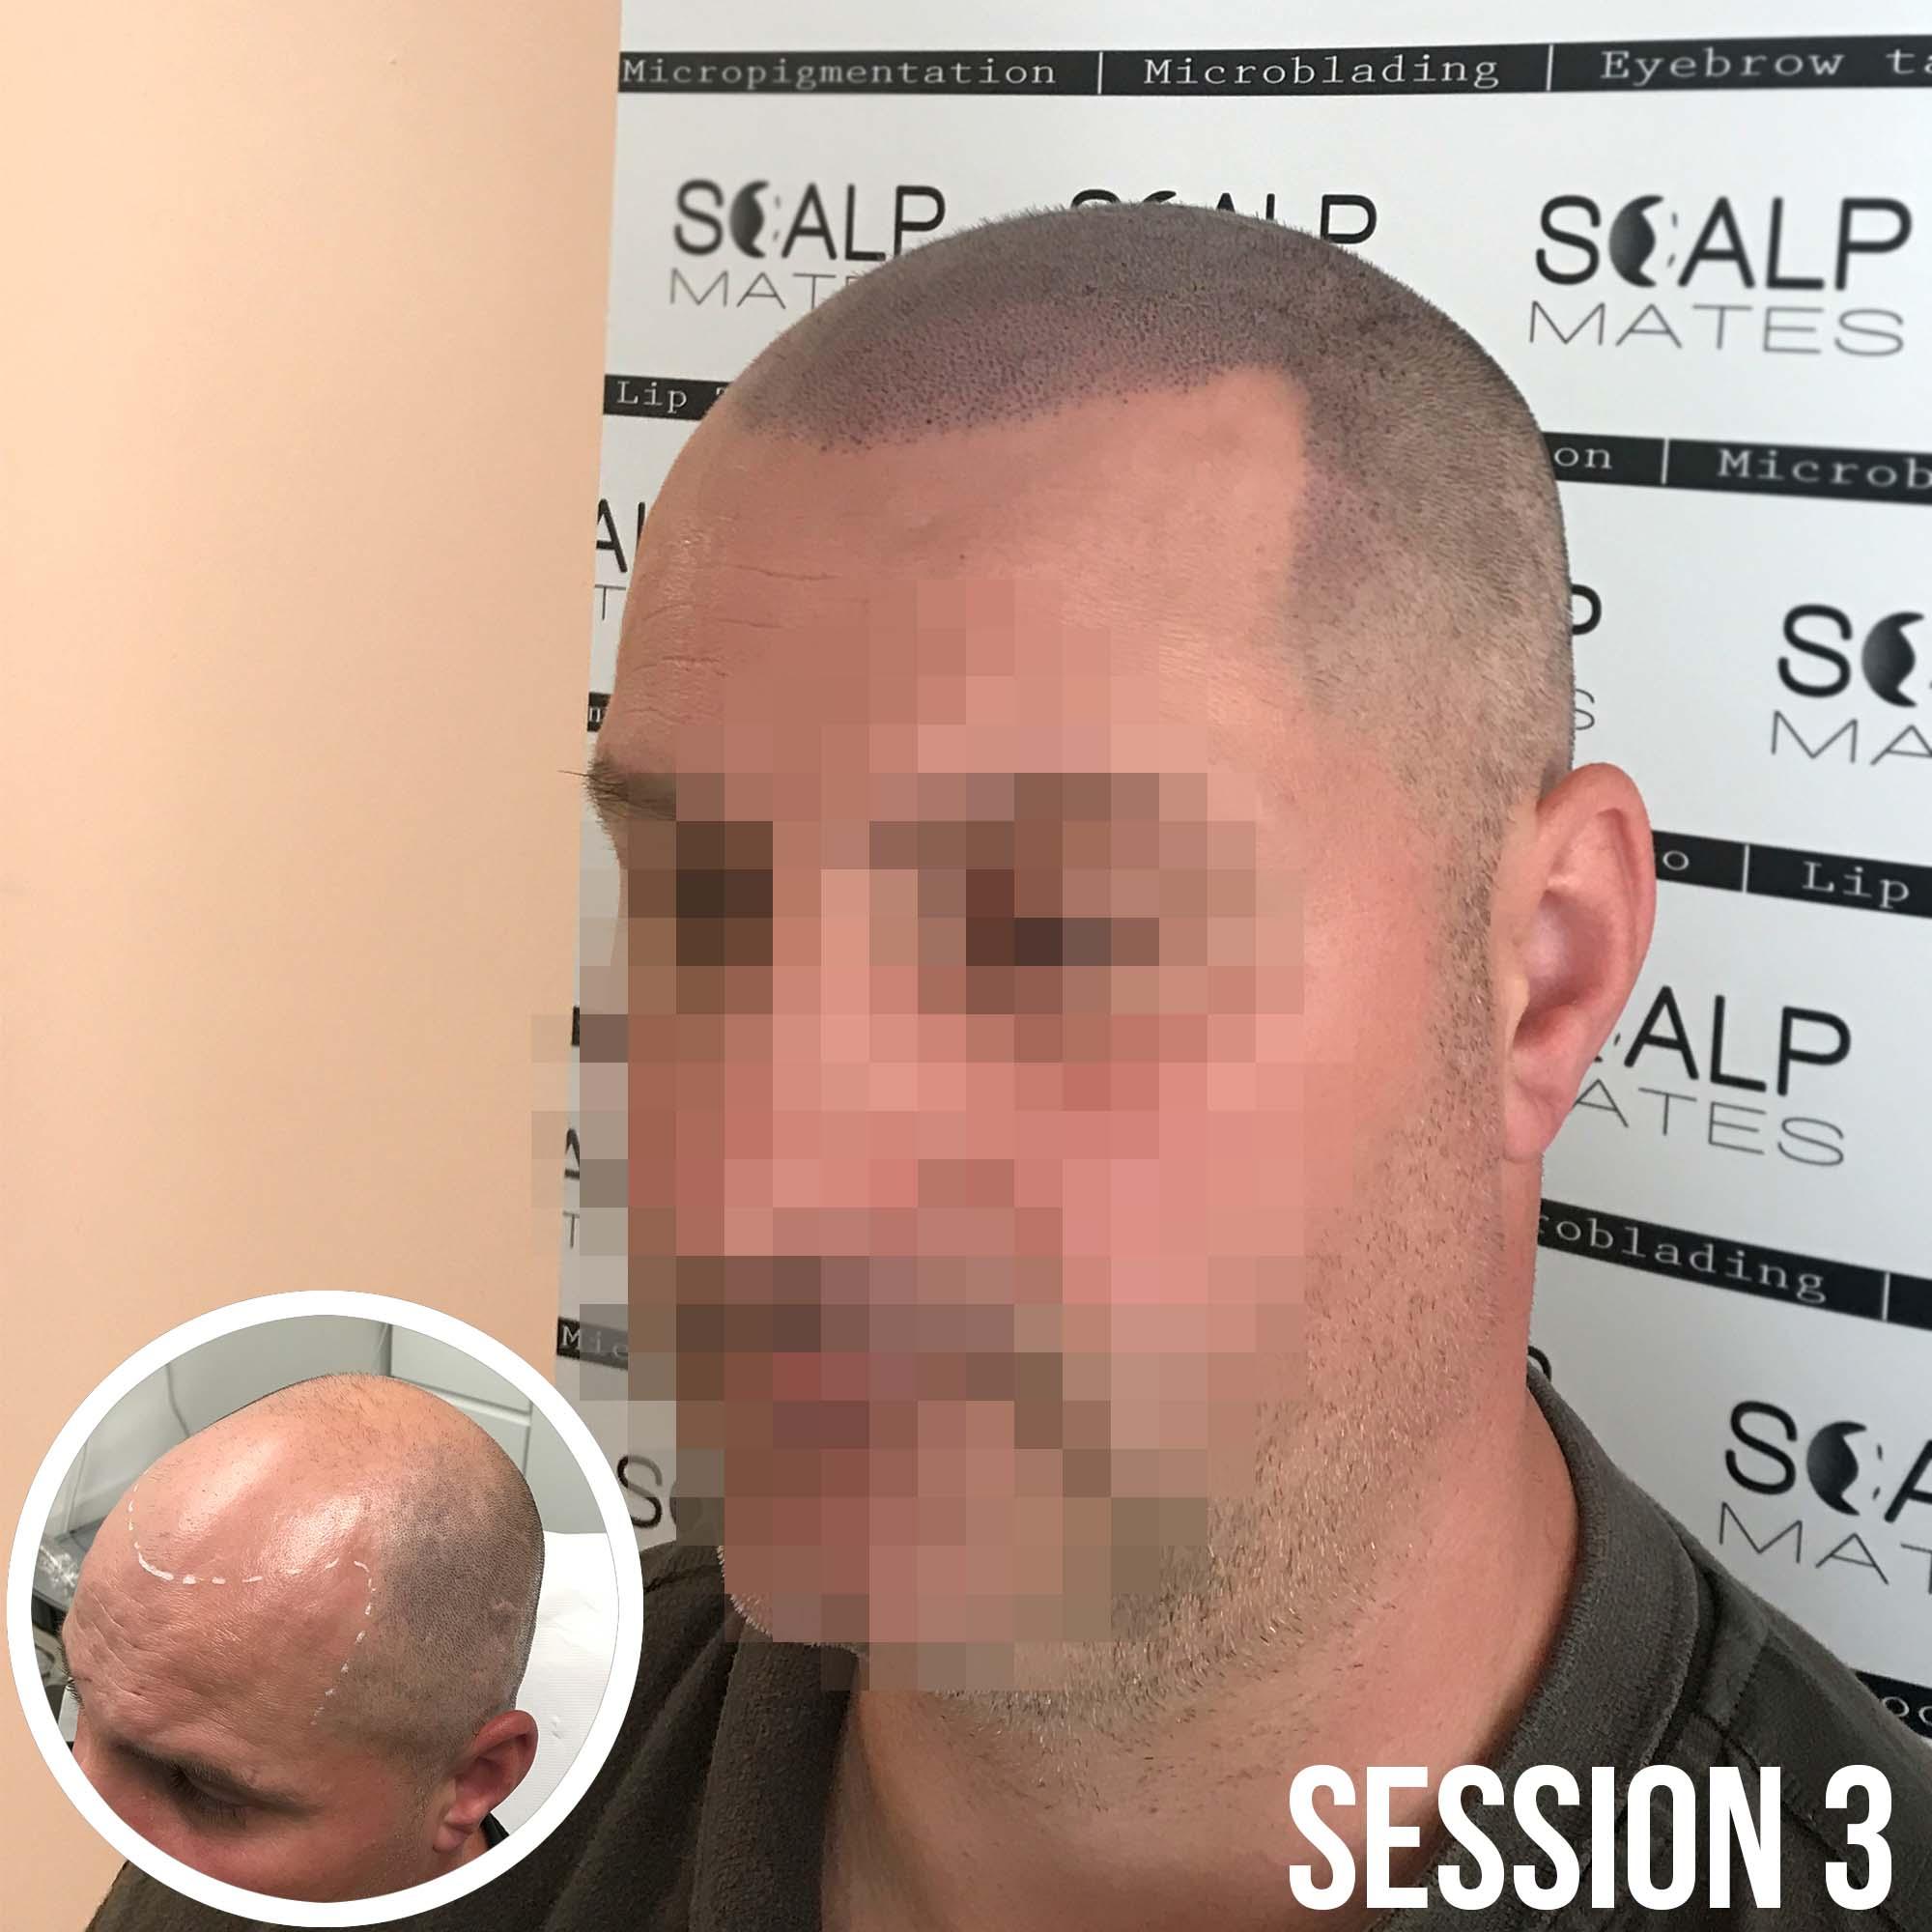 final result hairline tattoo on bald head at ScalpMates, Birmingham UK